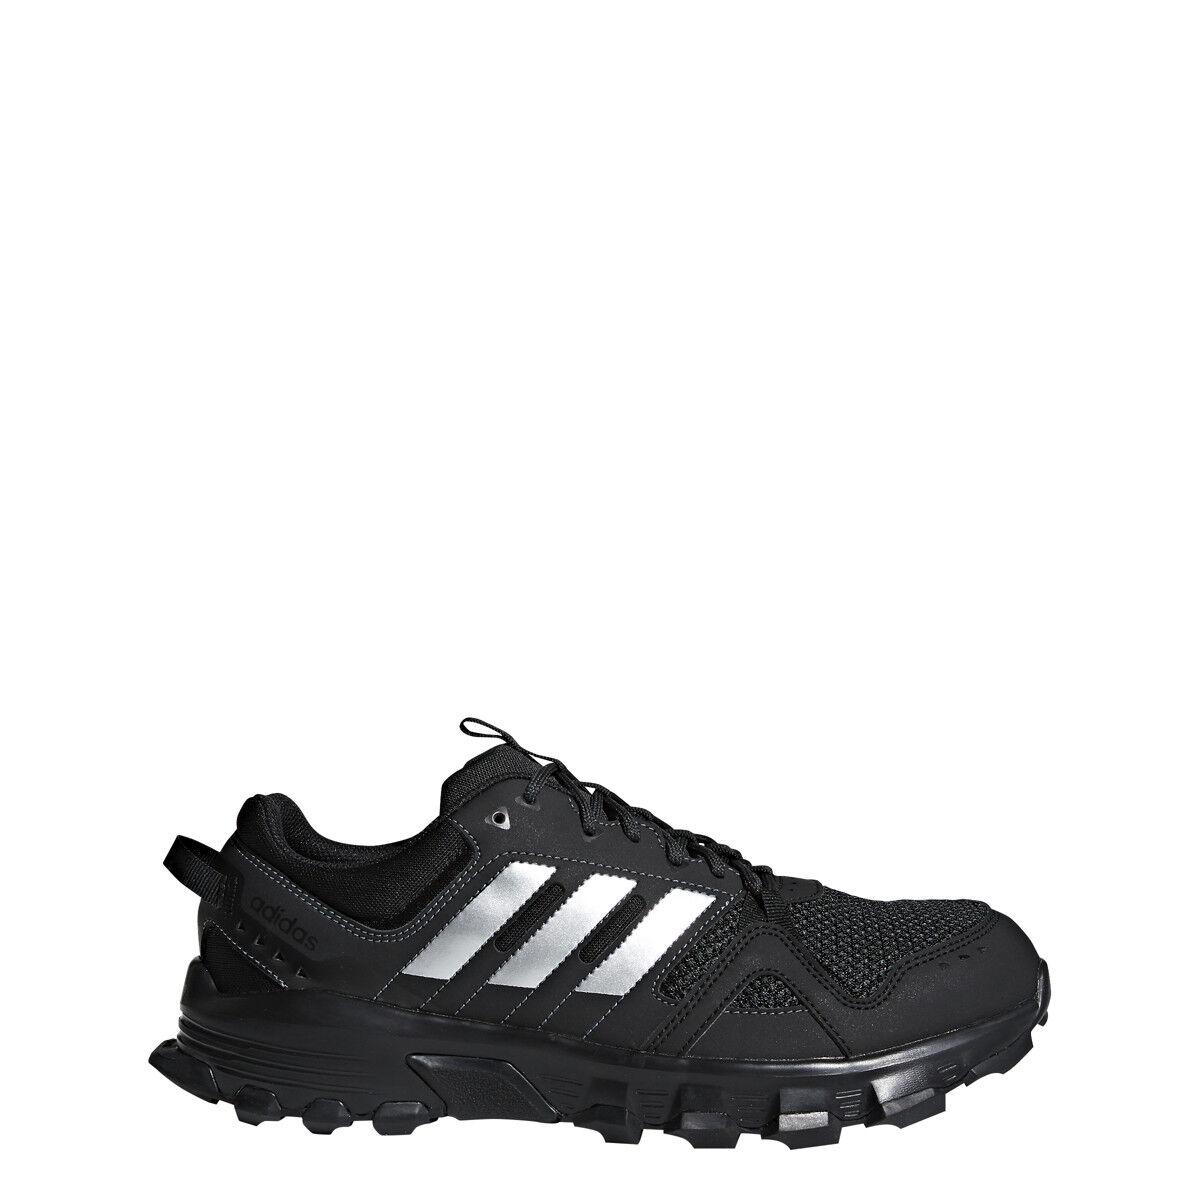 bei adidas rockadia spur sz weiten schwarzen athletic laufschuh ac7080 sz spur 8w-10.5w 0ef959